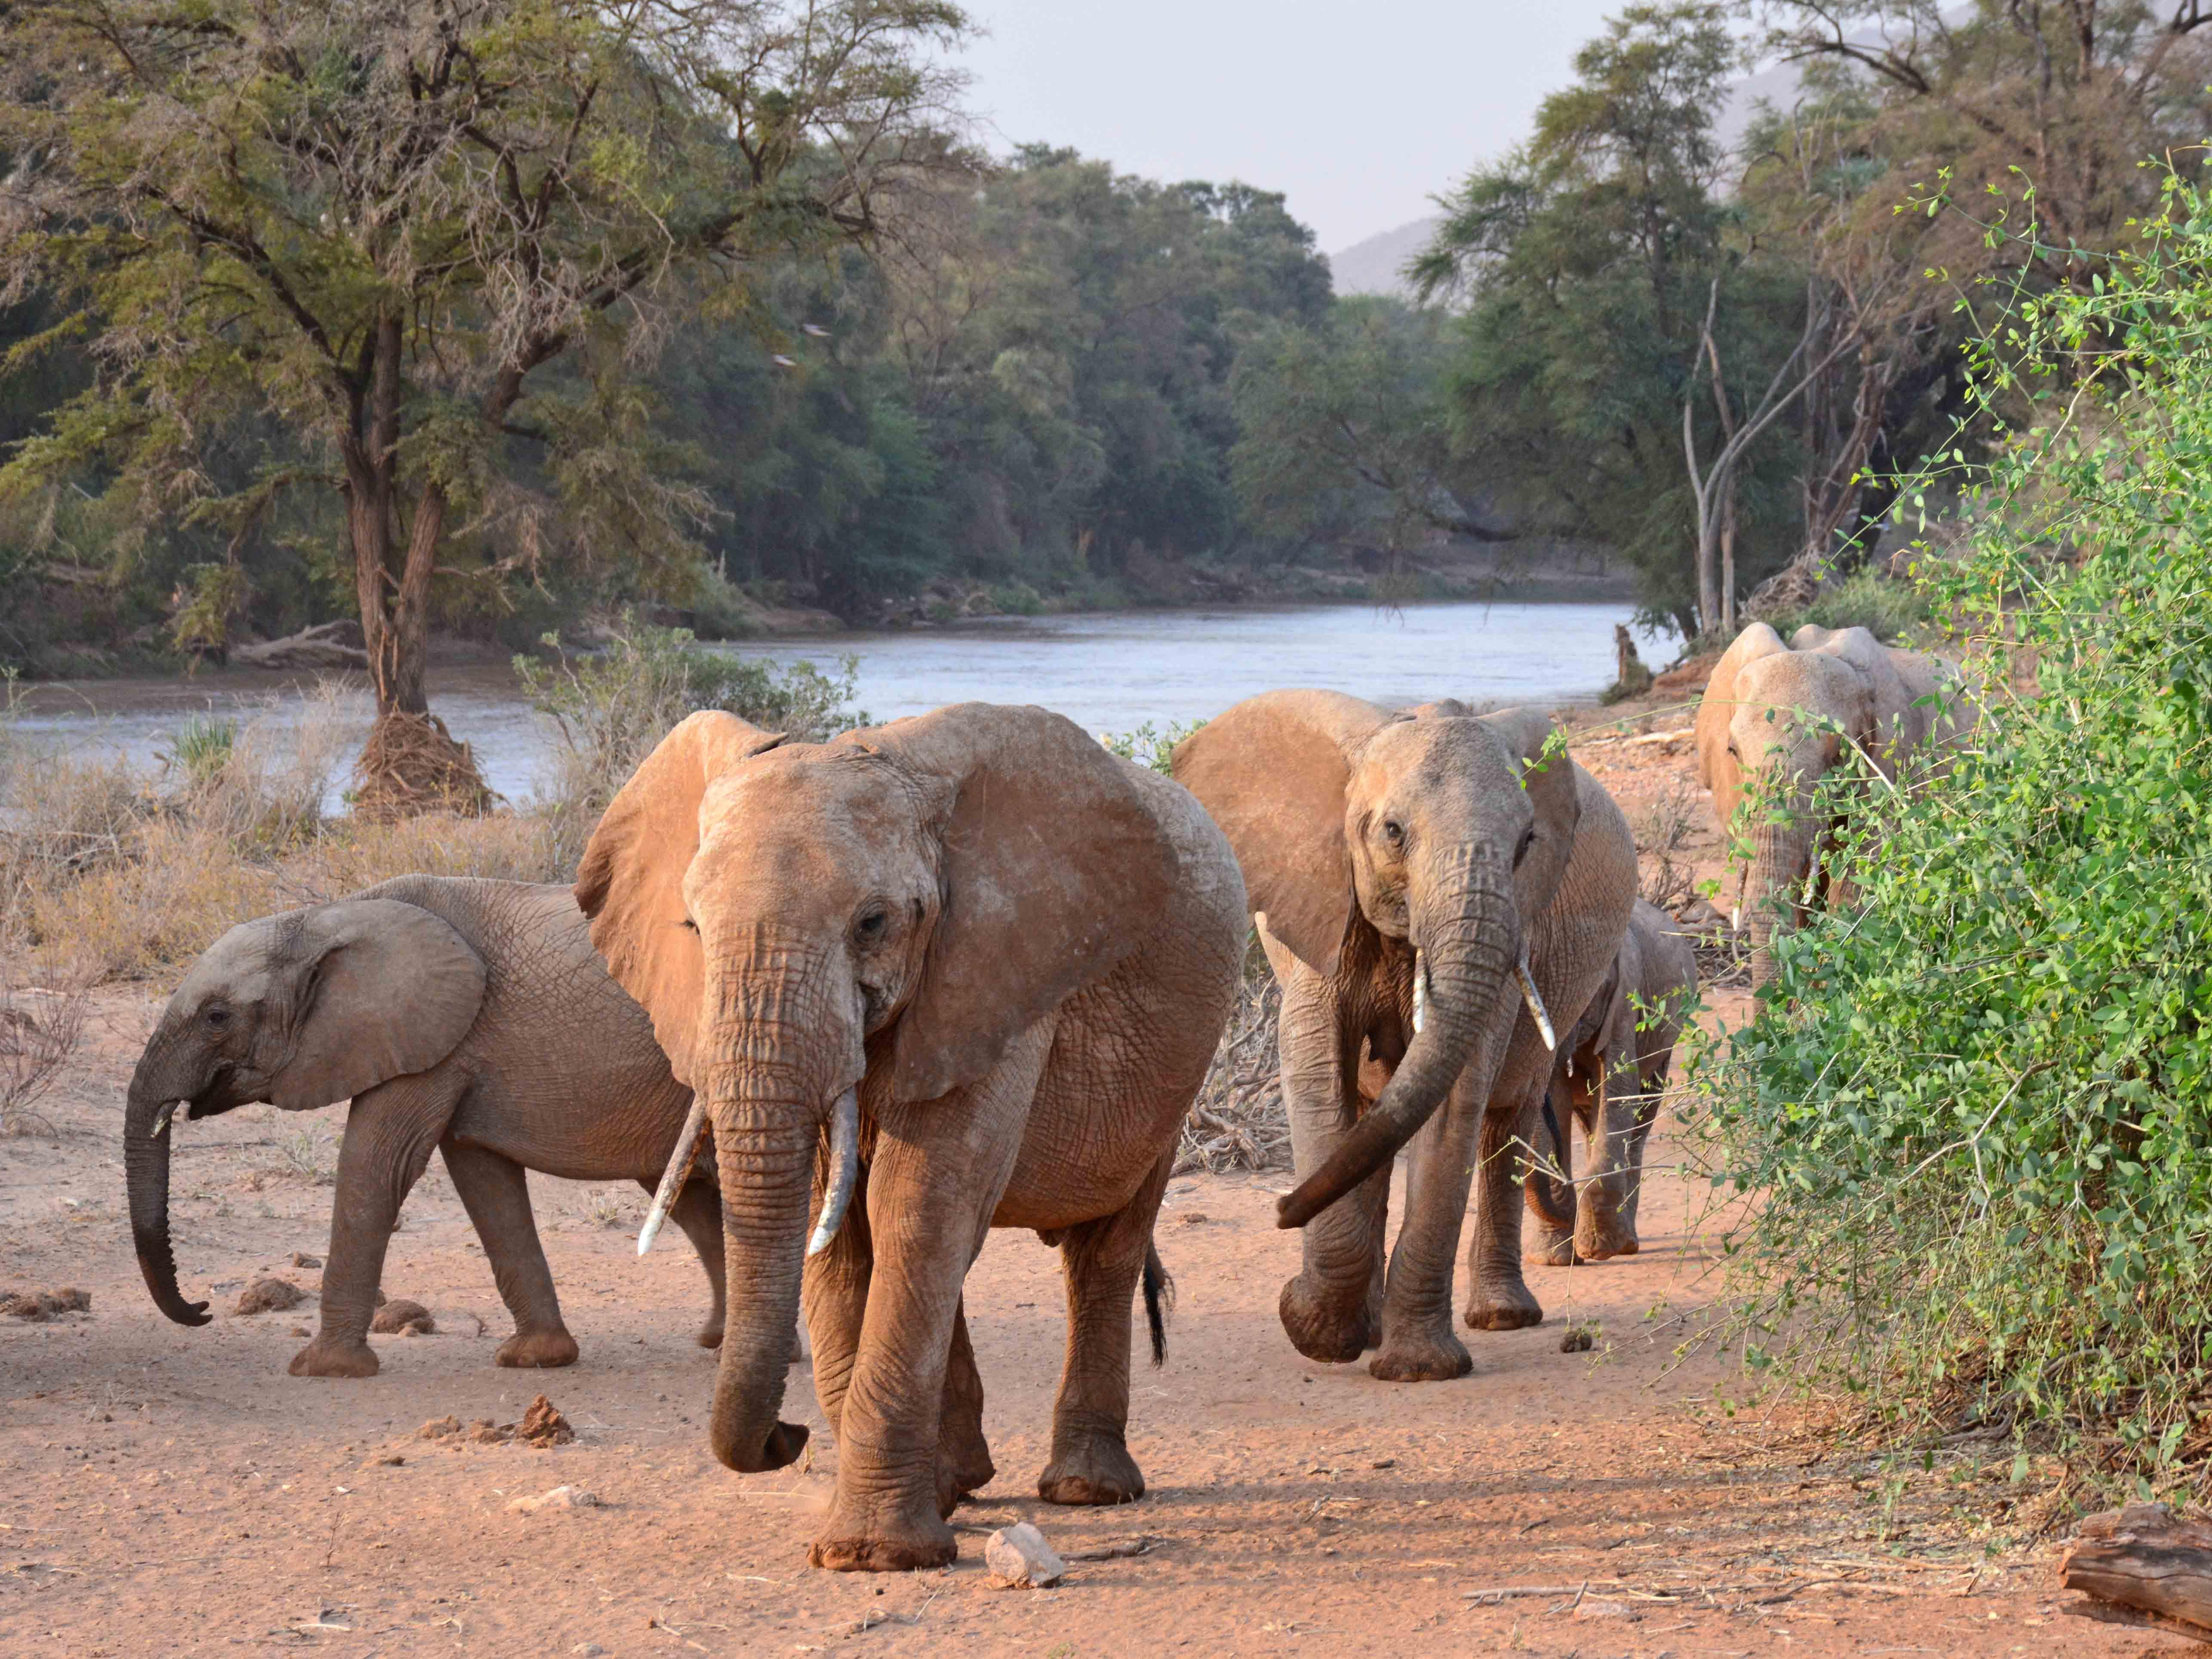 Samburu olifant Habiba, reis olifant